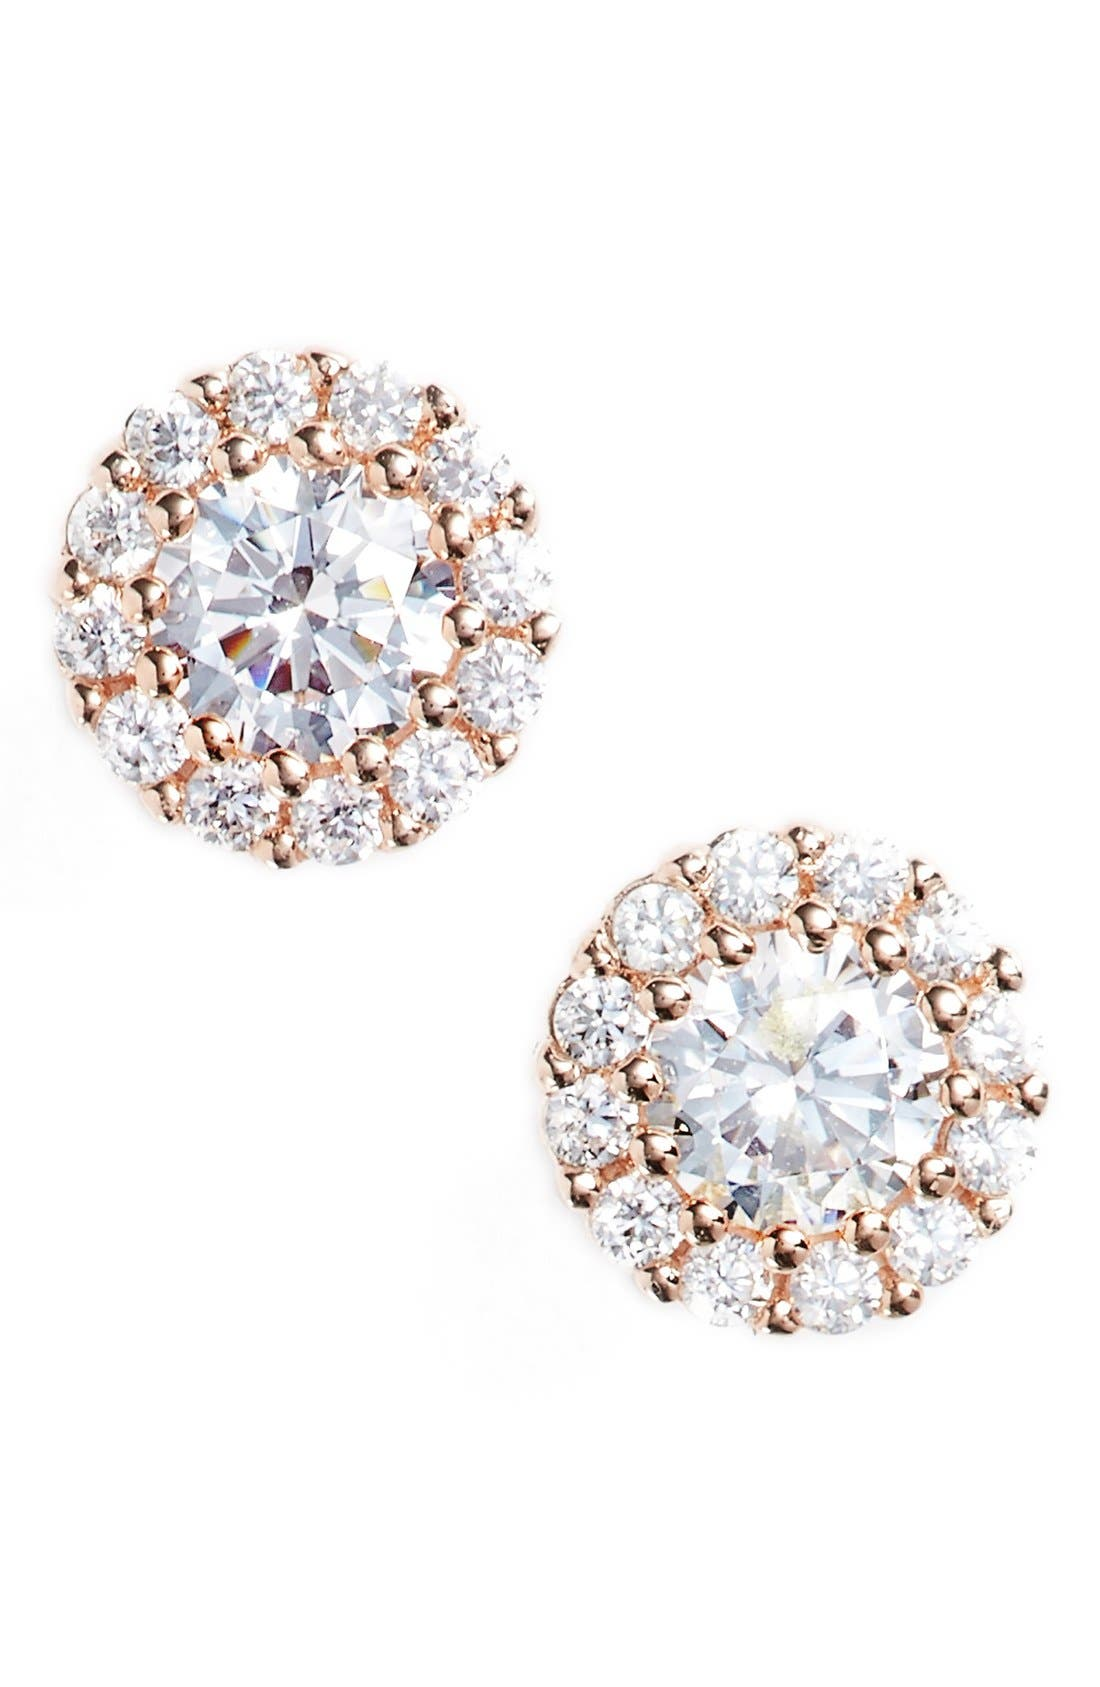 Nordstrom Precious Metal Plated 0.50ct tw Cubic Zirconia Stud Earrings